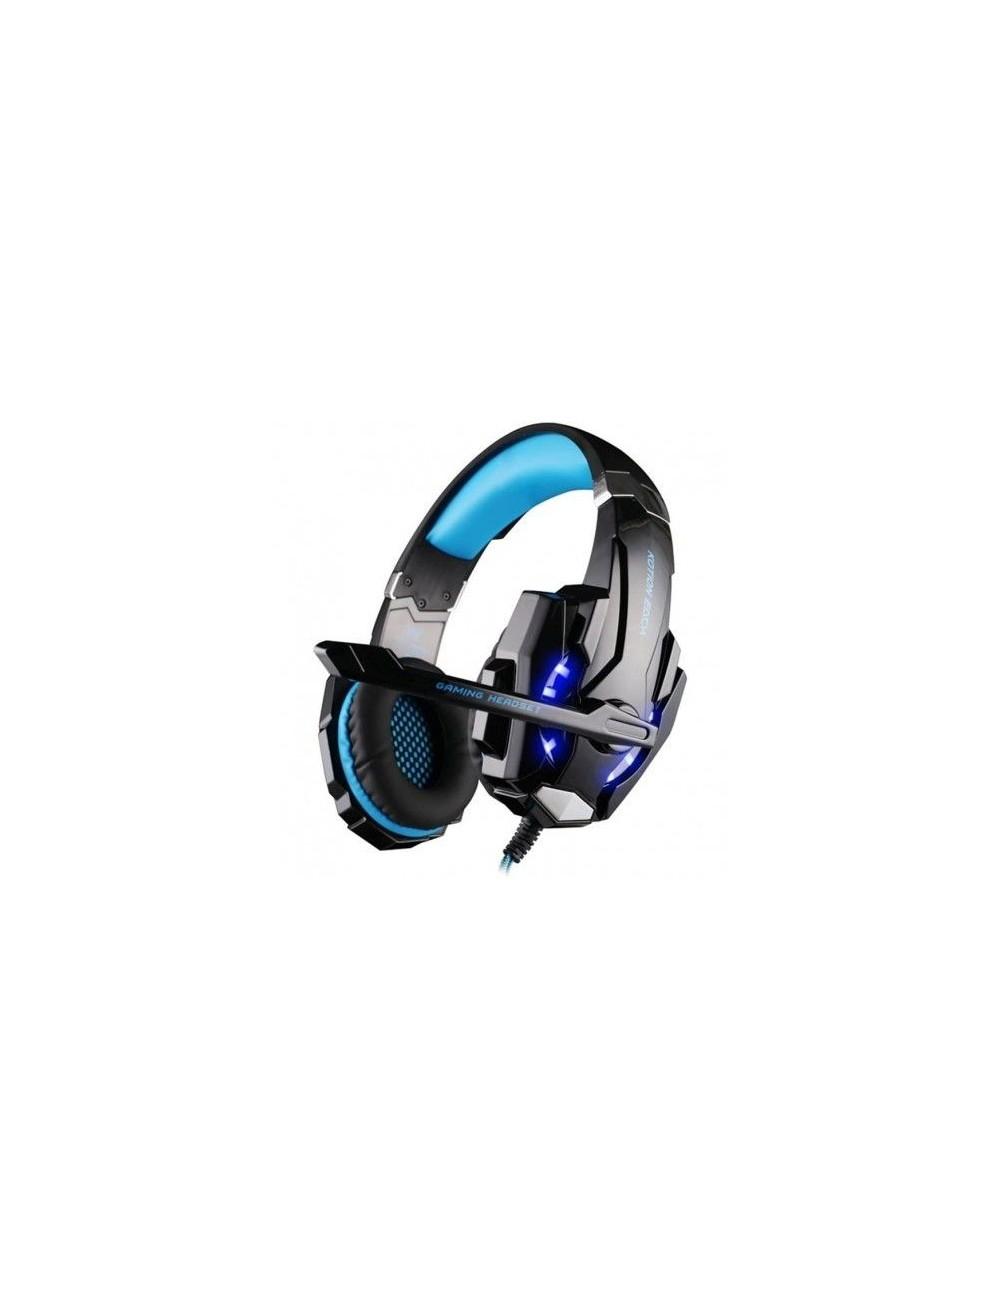 Auriculares Gaming Myo MY4060A Azul Juegos Micrófono